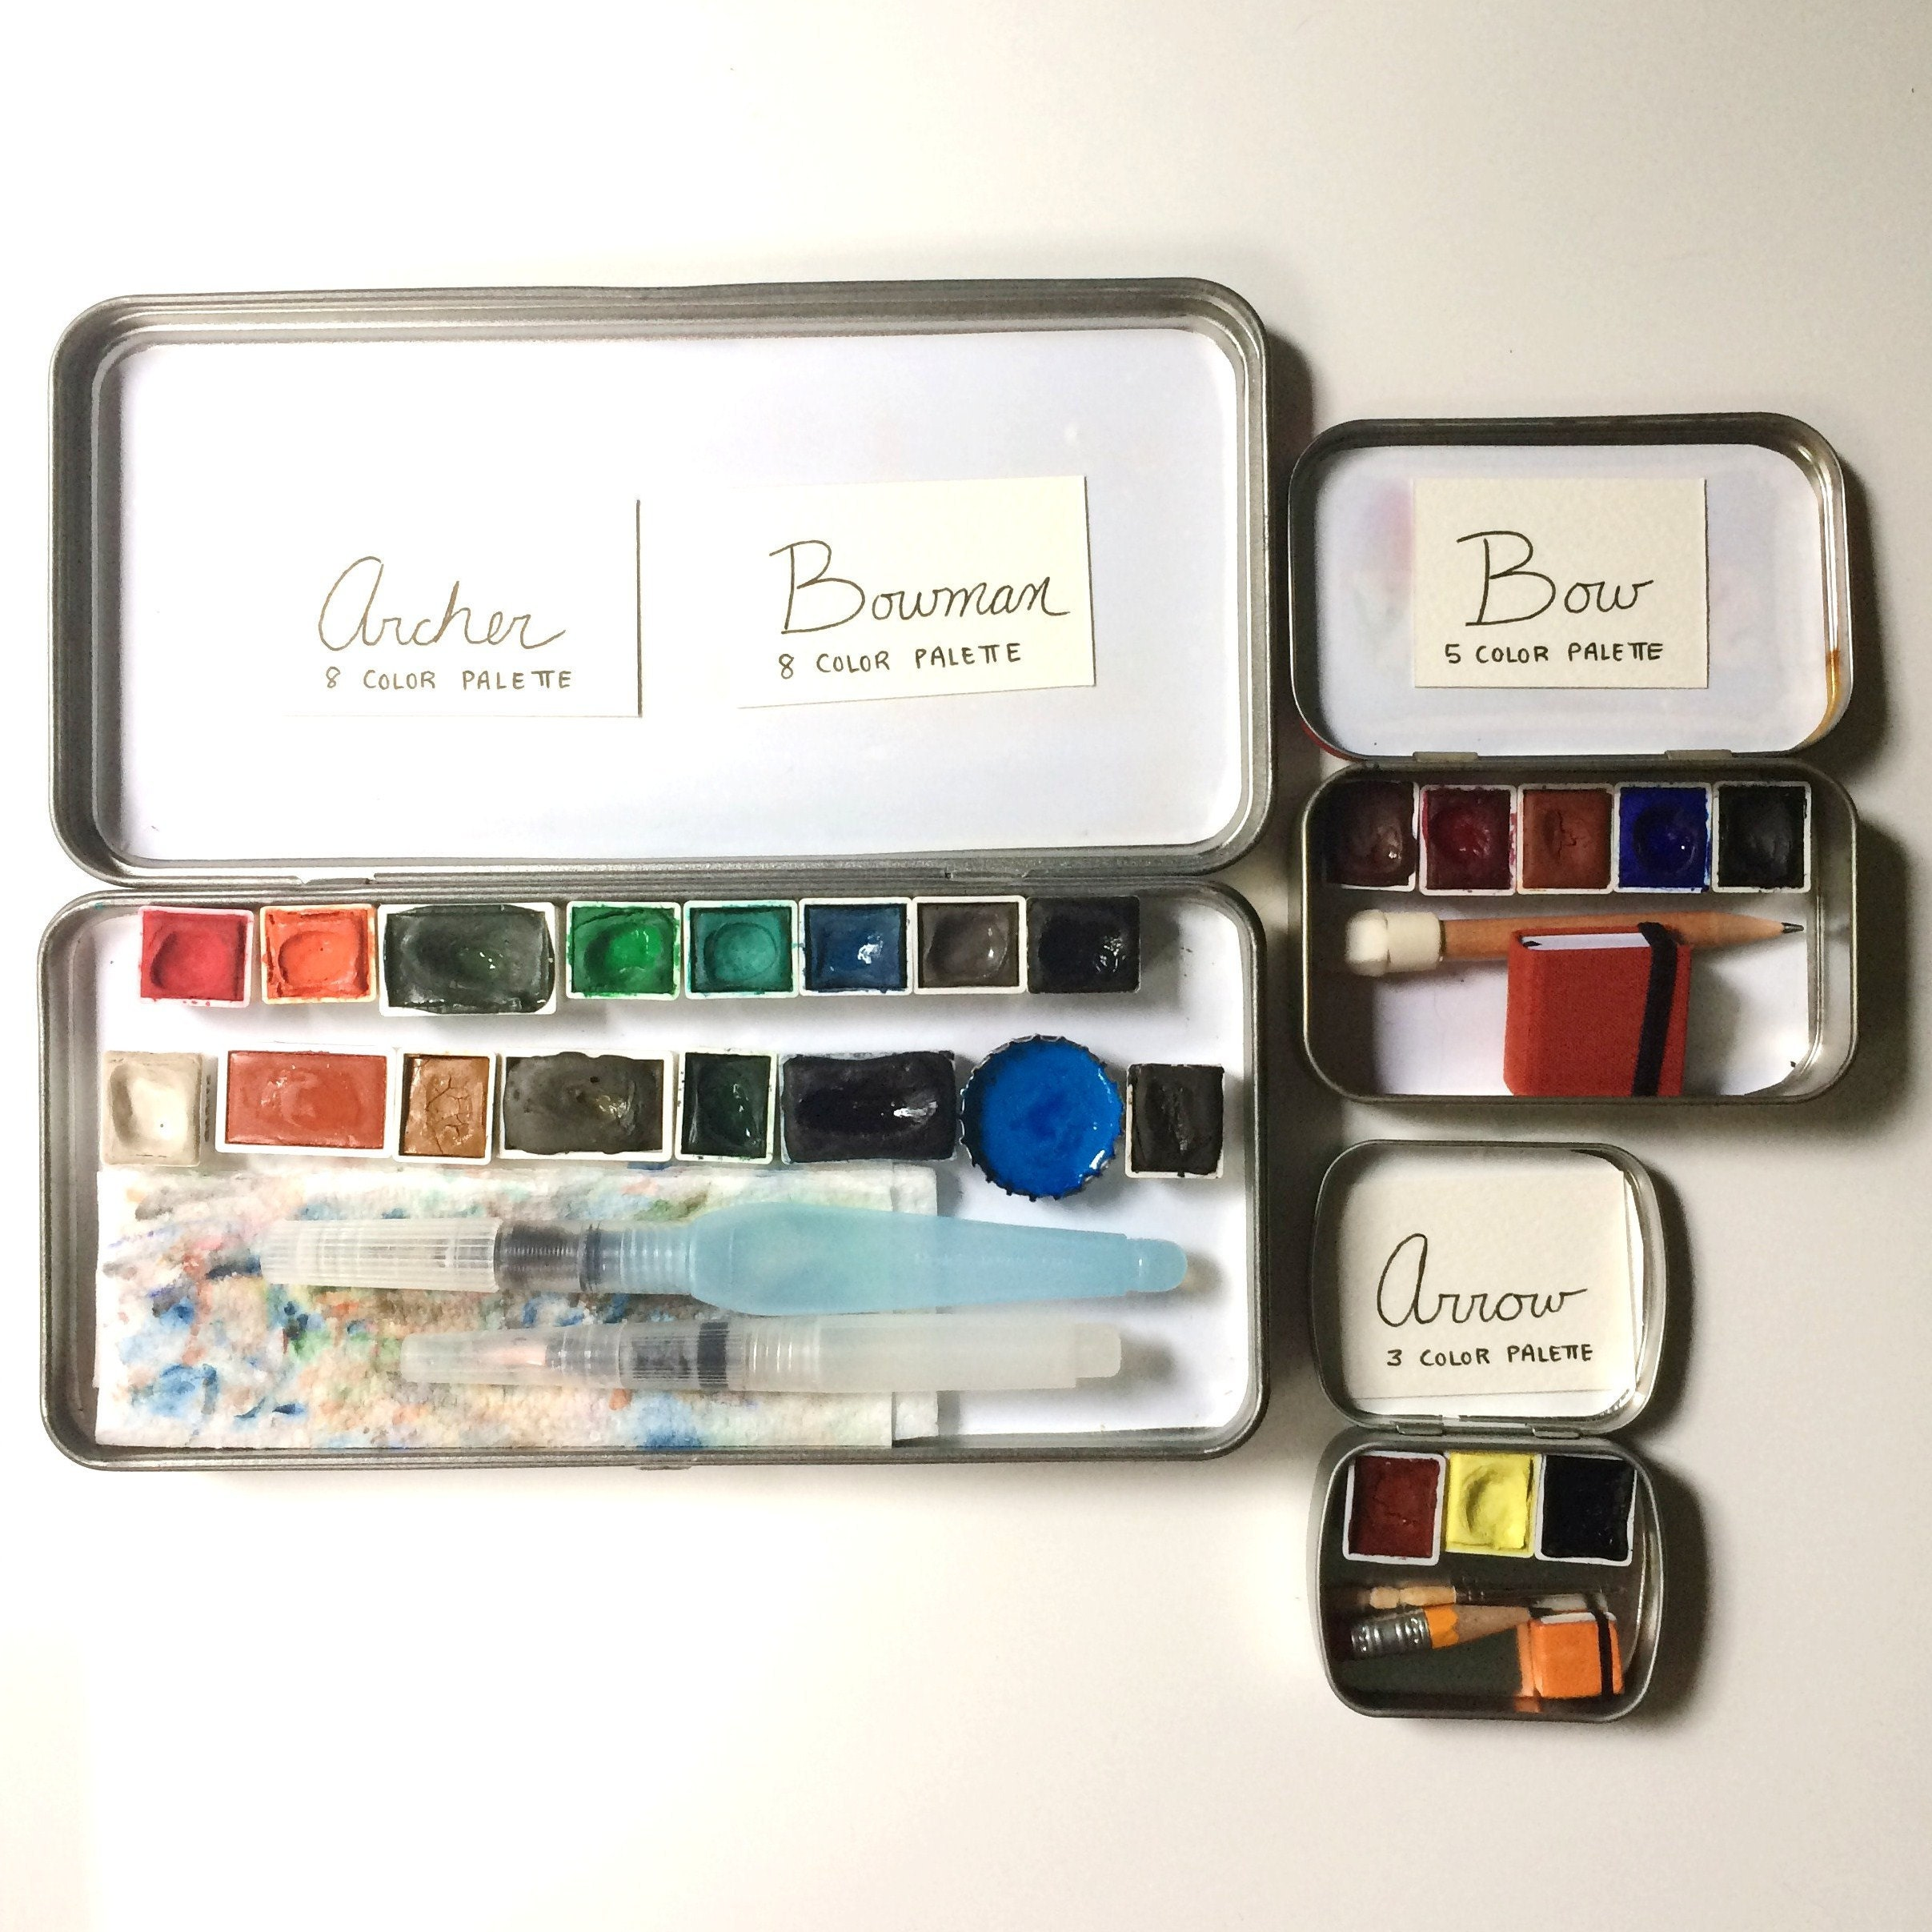 four new palettes